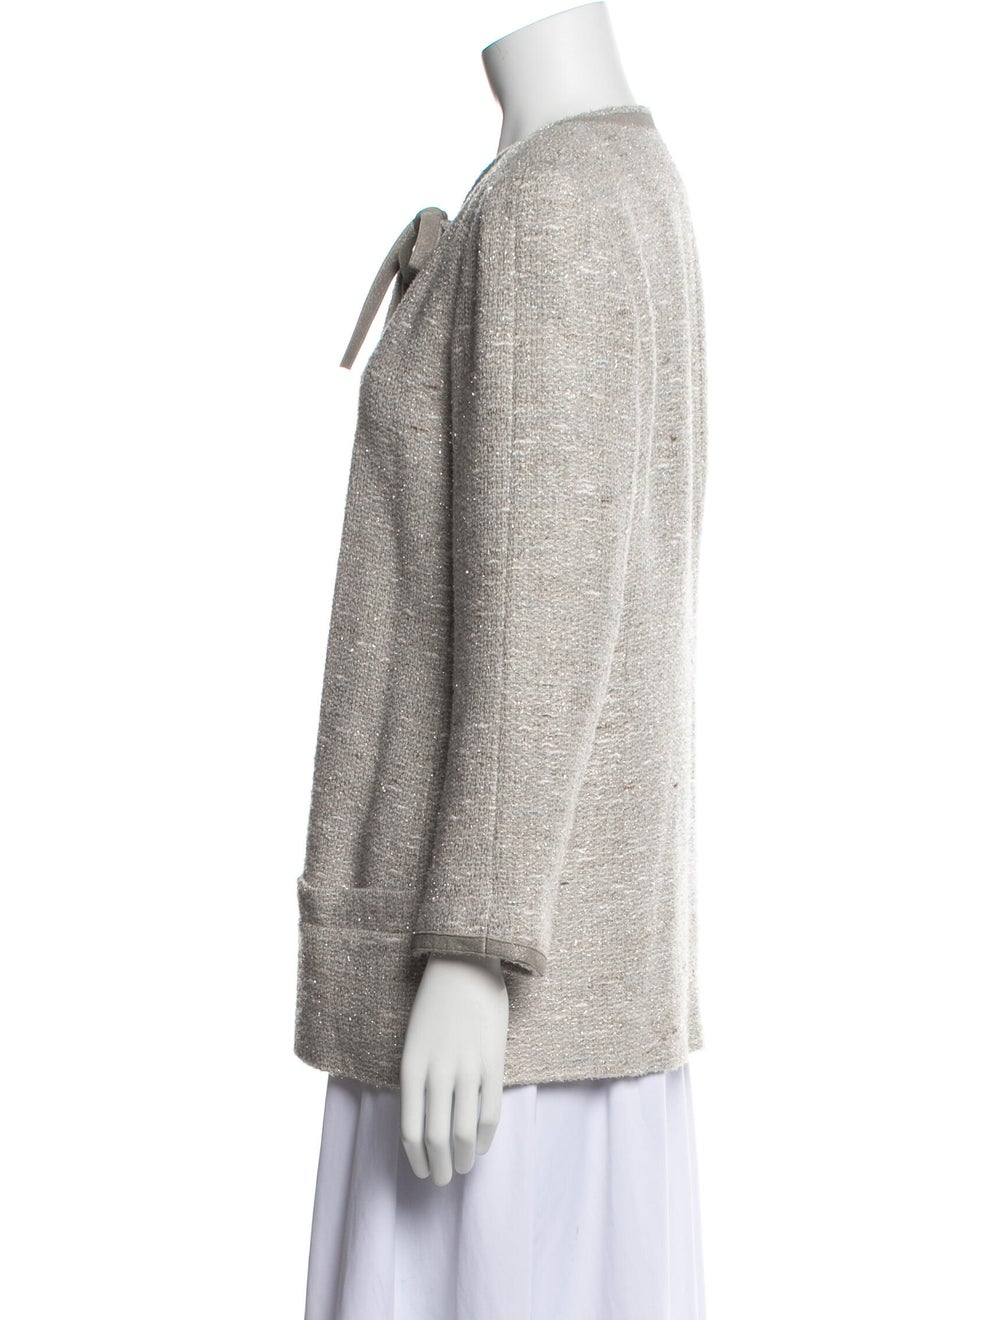 Chanel Vintage 1999 Evening Jacket Grey - image 2